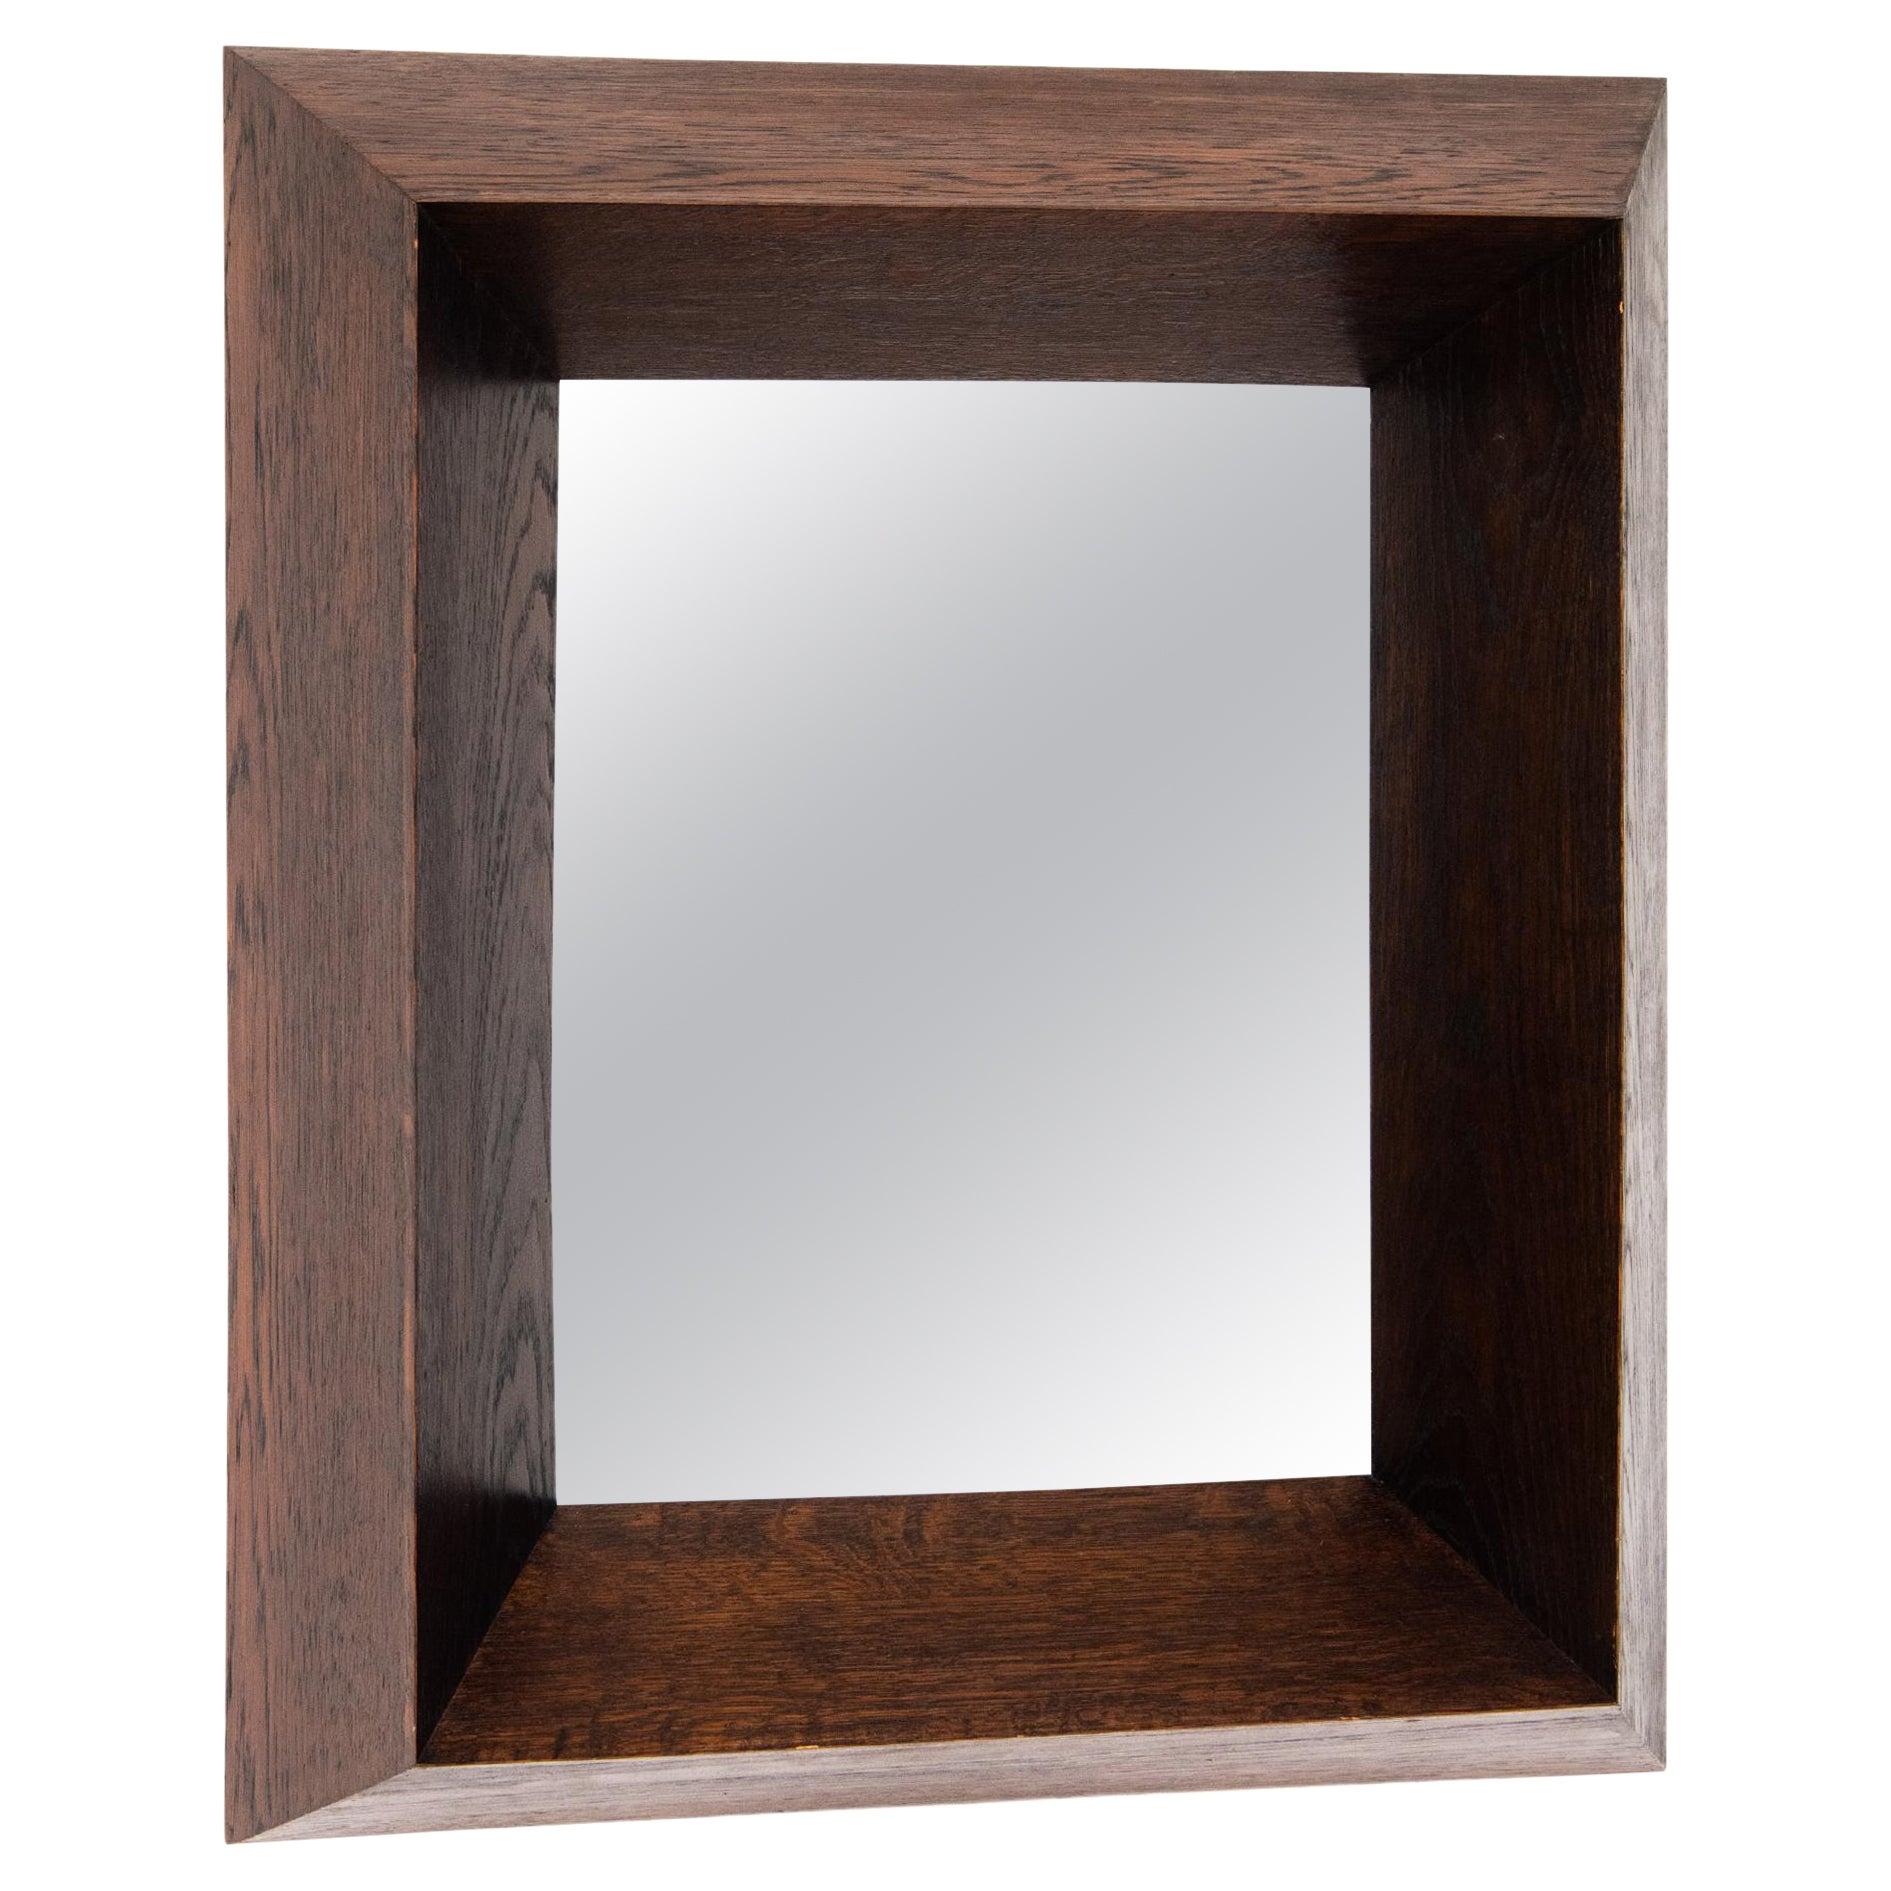 Belgian, Art Deco Cubist Wood Framed Mirror, c. 1930